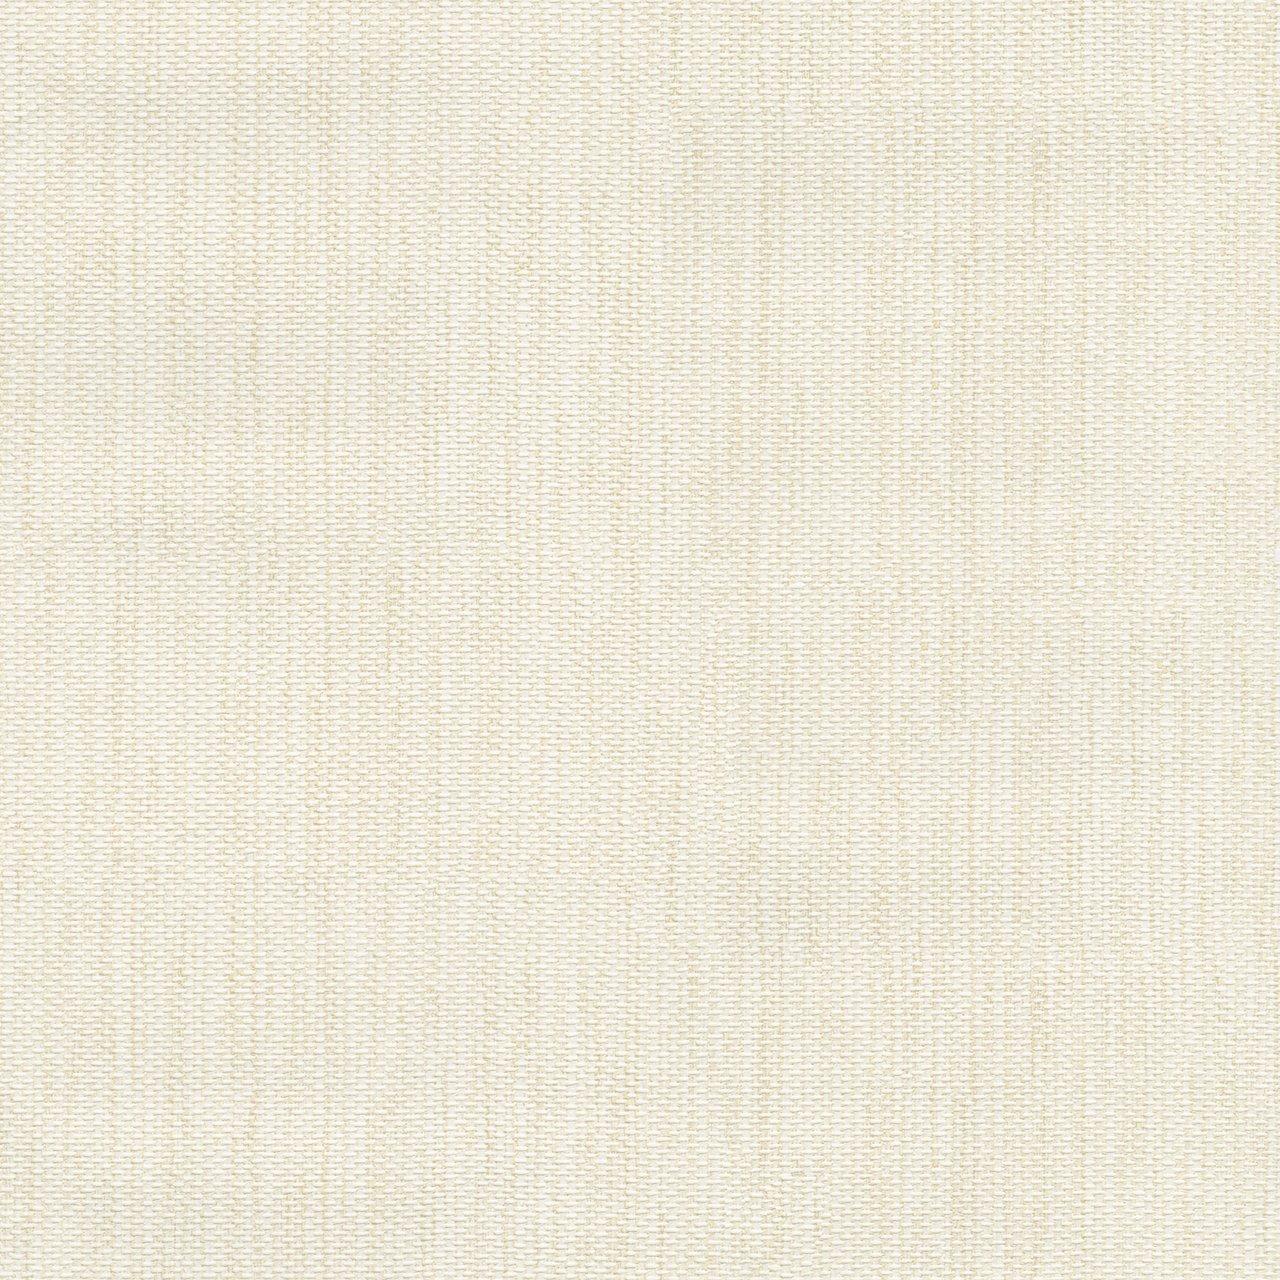 Belgravia Moda Dahlia Plain Textured Wallpaper - 6125 -Cream